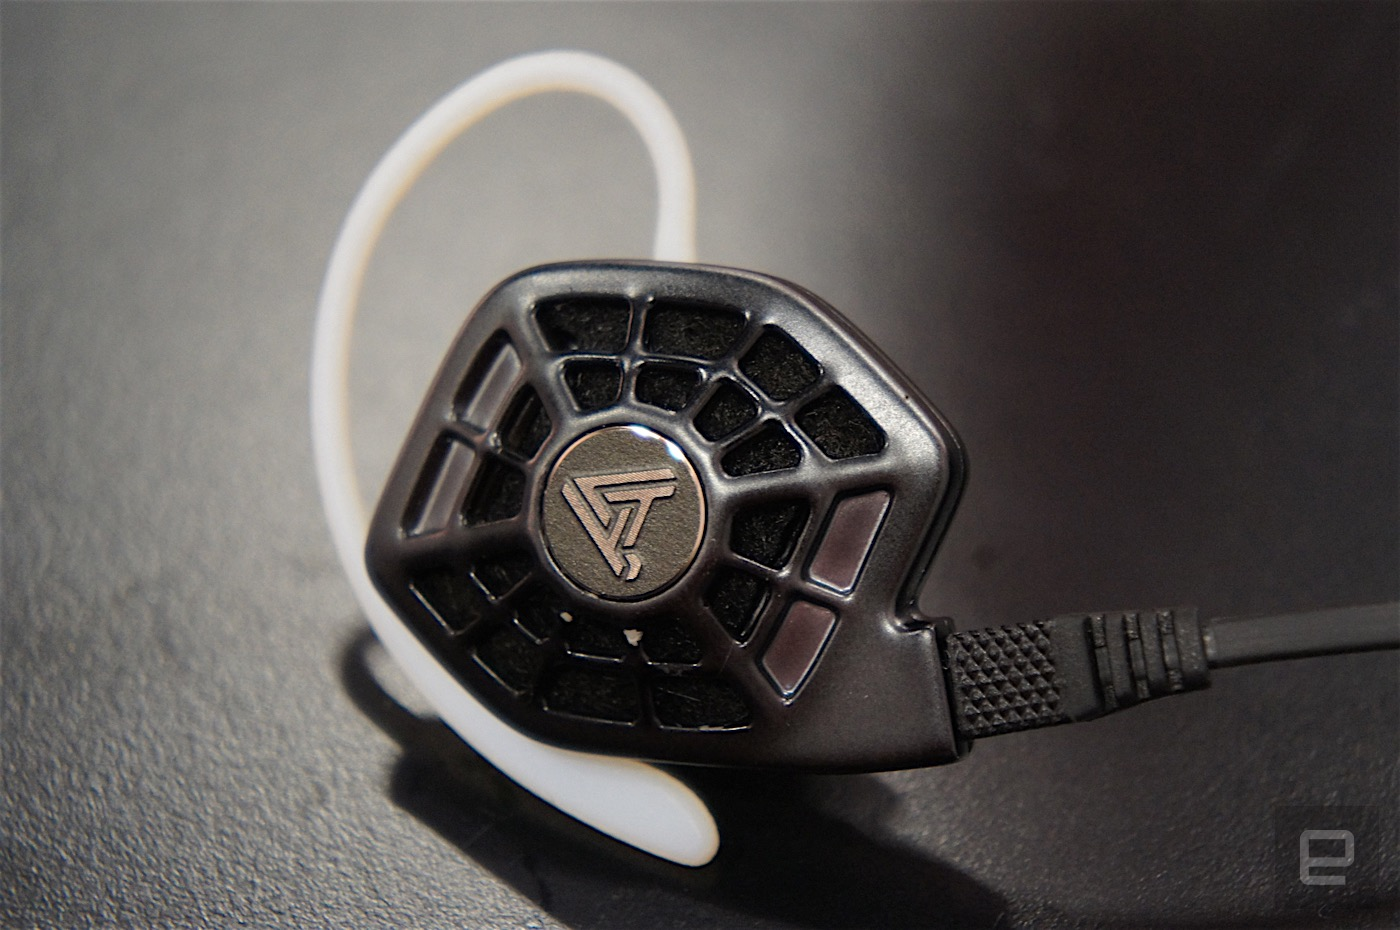 Audeze In-Ear iSINE 10 Headphones Provide Beautiful Sounds